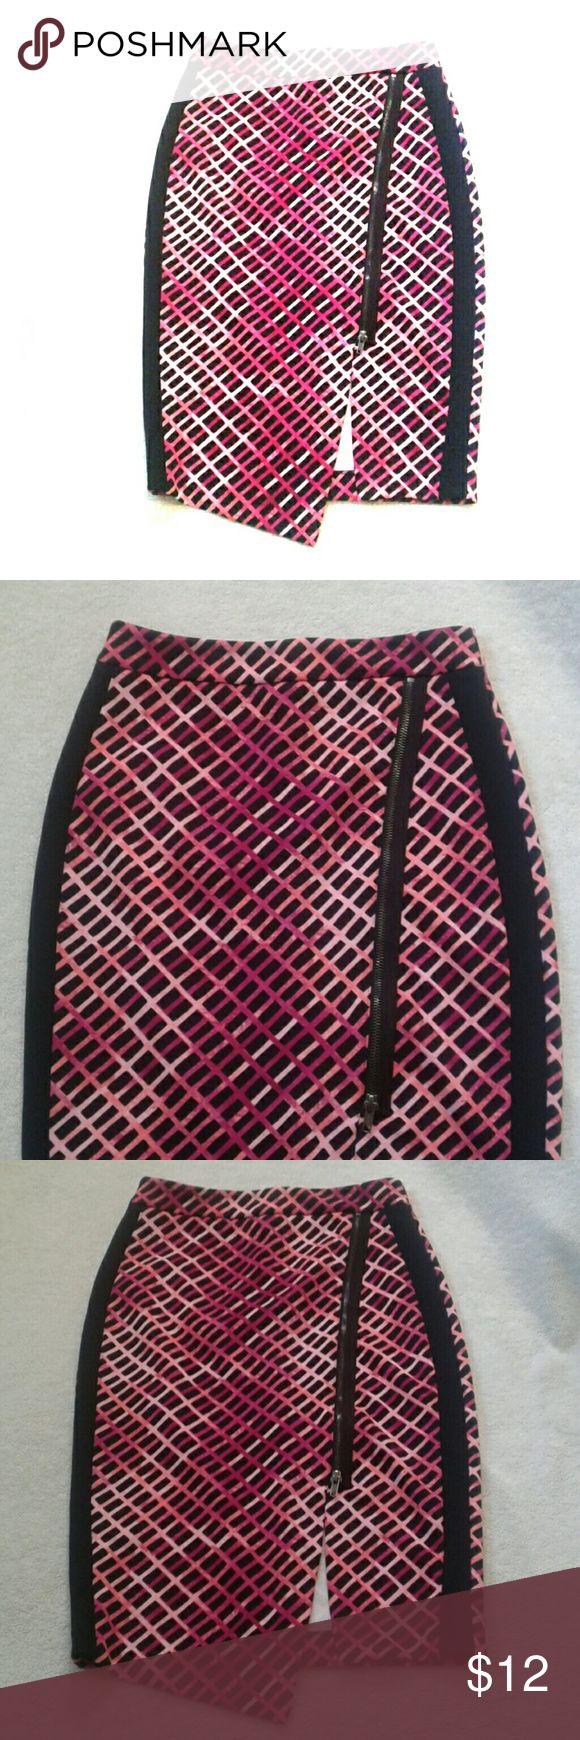 Worthington petite skirt sz. 2p Worthington petite skirt sz 2p. Great like new. Add to your fall collection. Worthington Skirts